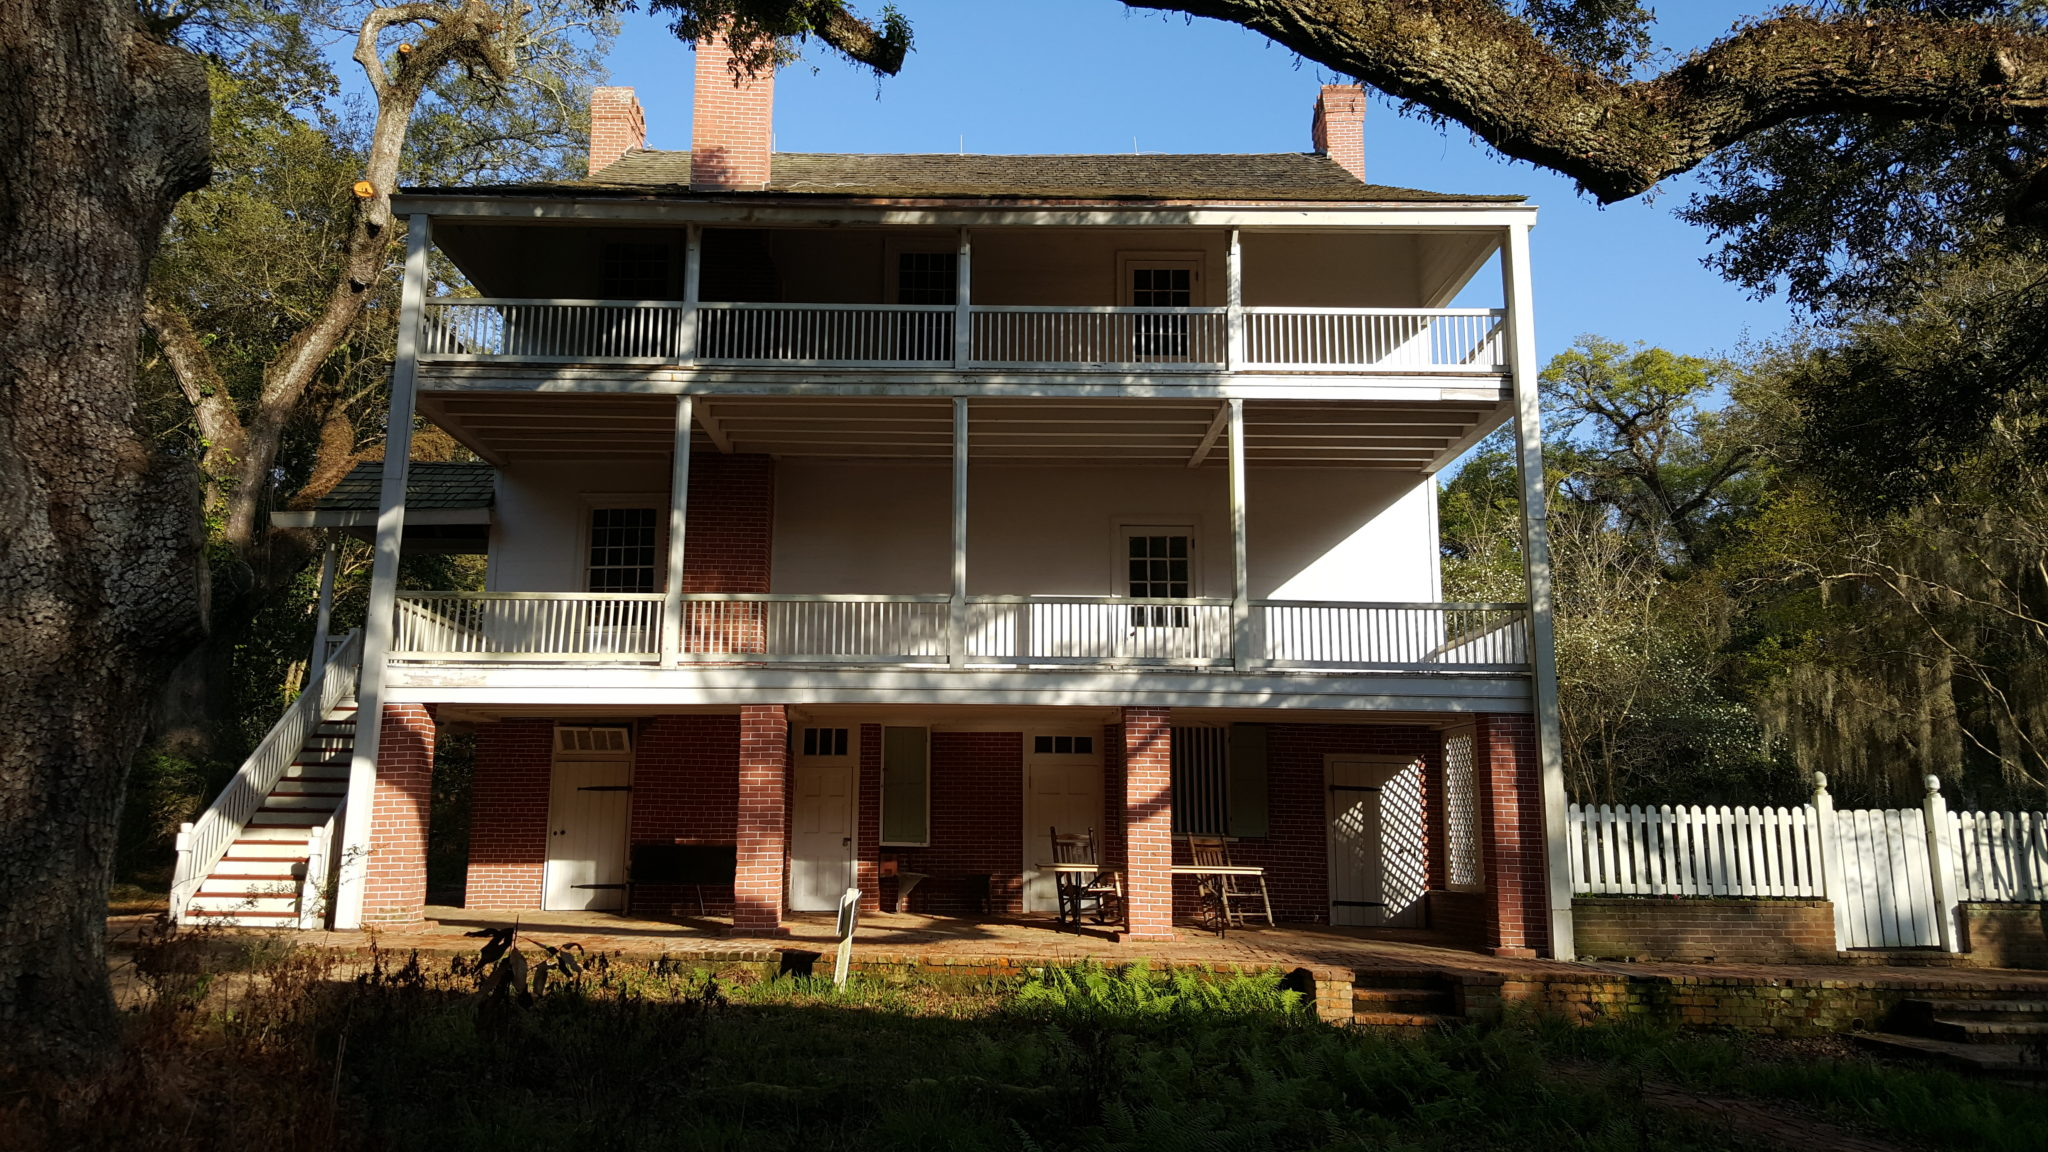 8195 oakley circle - Oakley Plantation St Francisville Louisiana